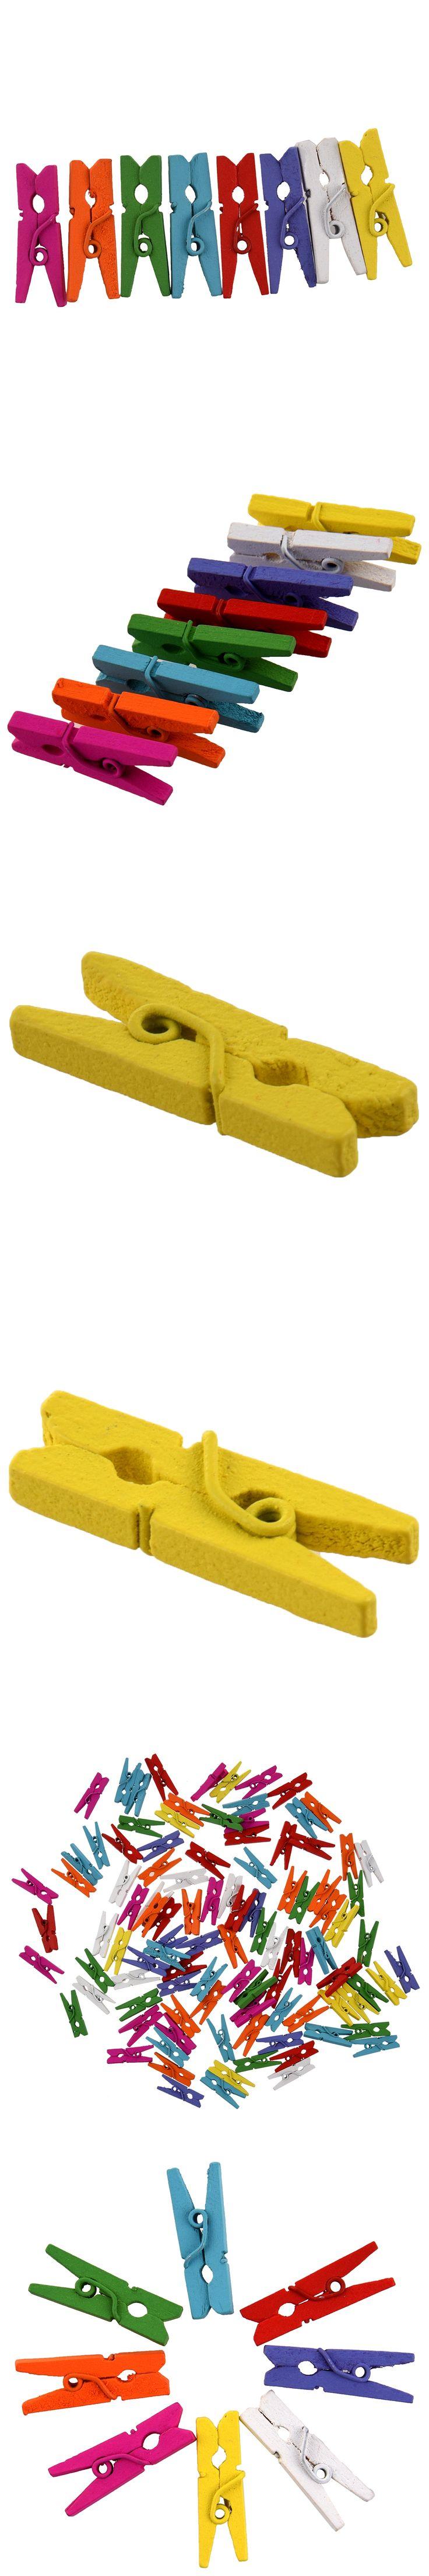 Mini Wooden Pegs - Multi Coloured 100pk